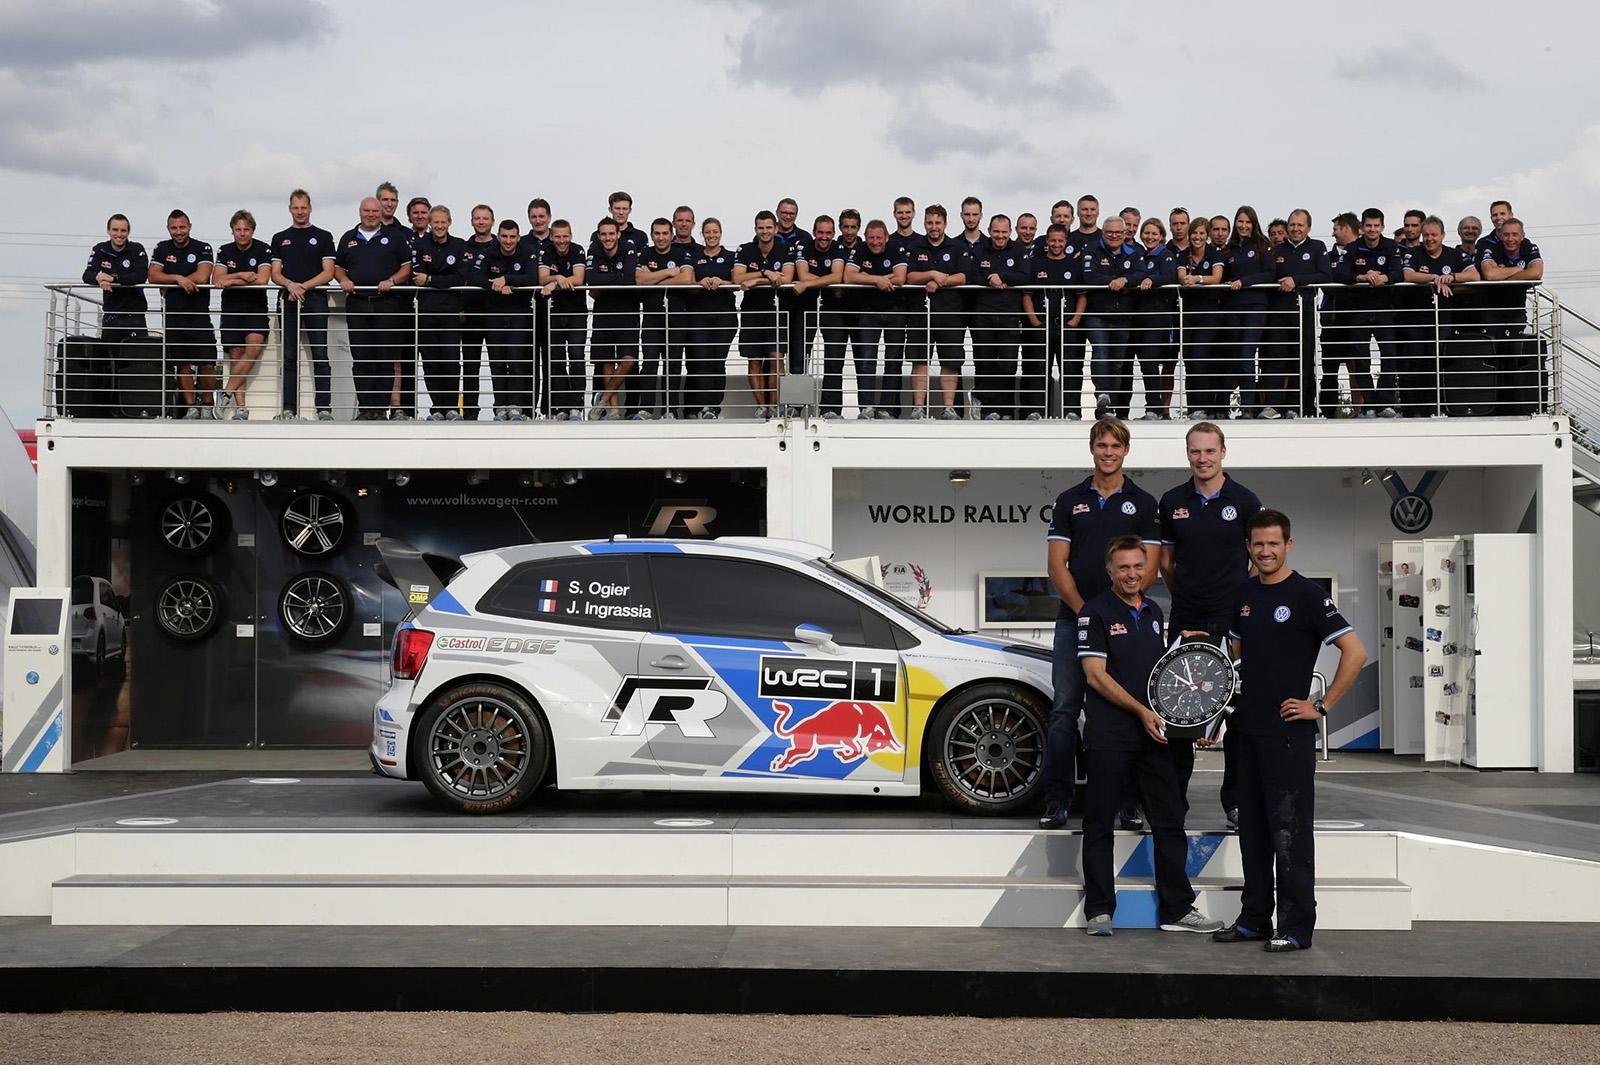 01_VW-WRC14-09-BK1-0219